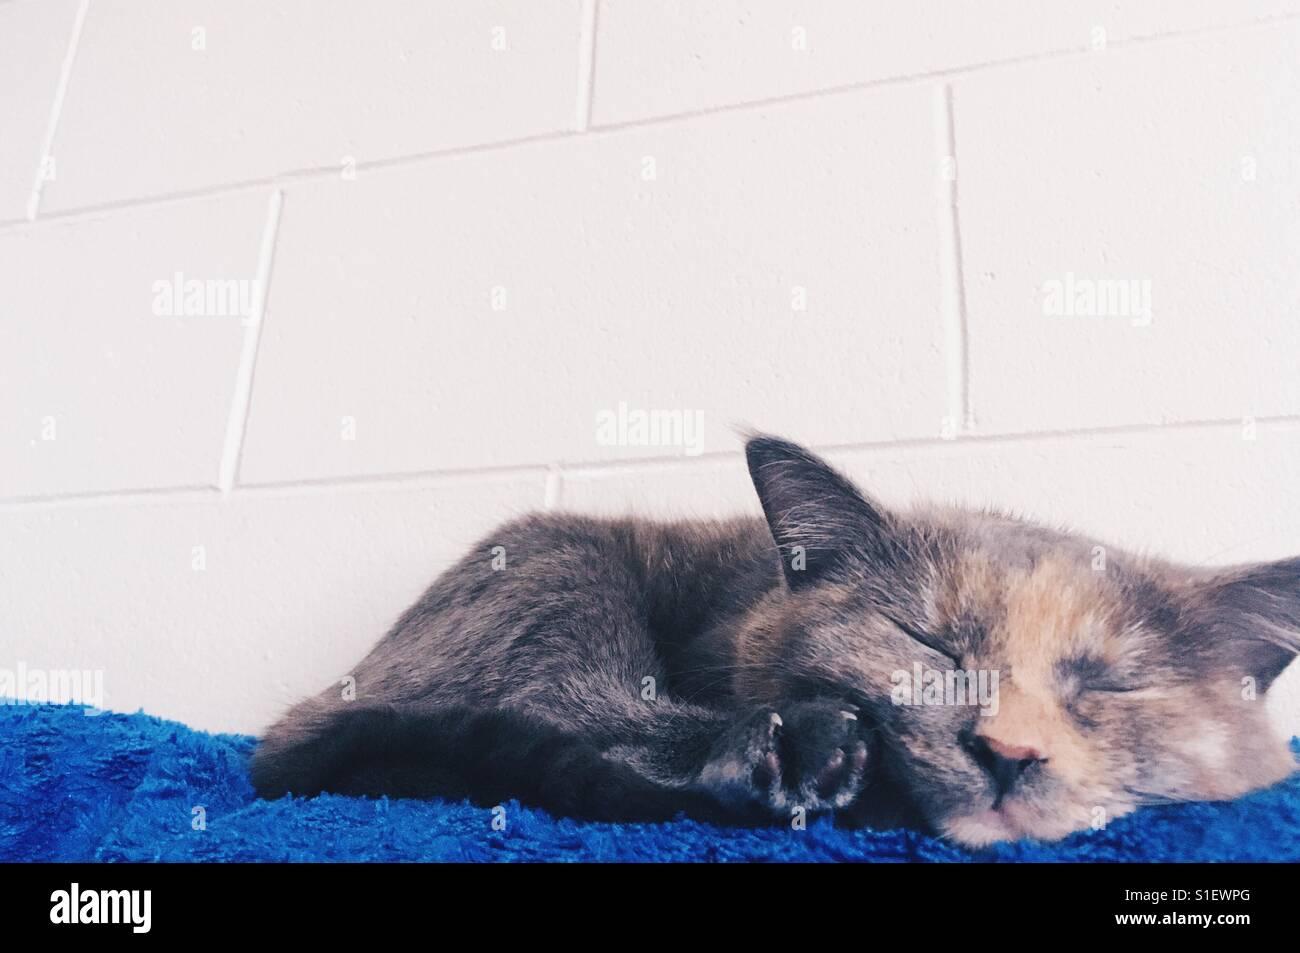 Sleeping munchkin cat - Stock Image